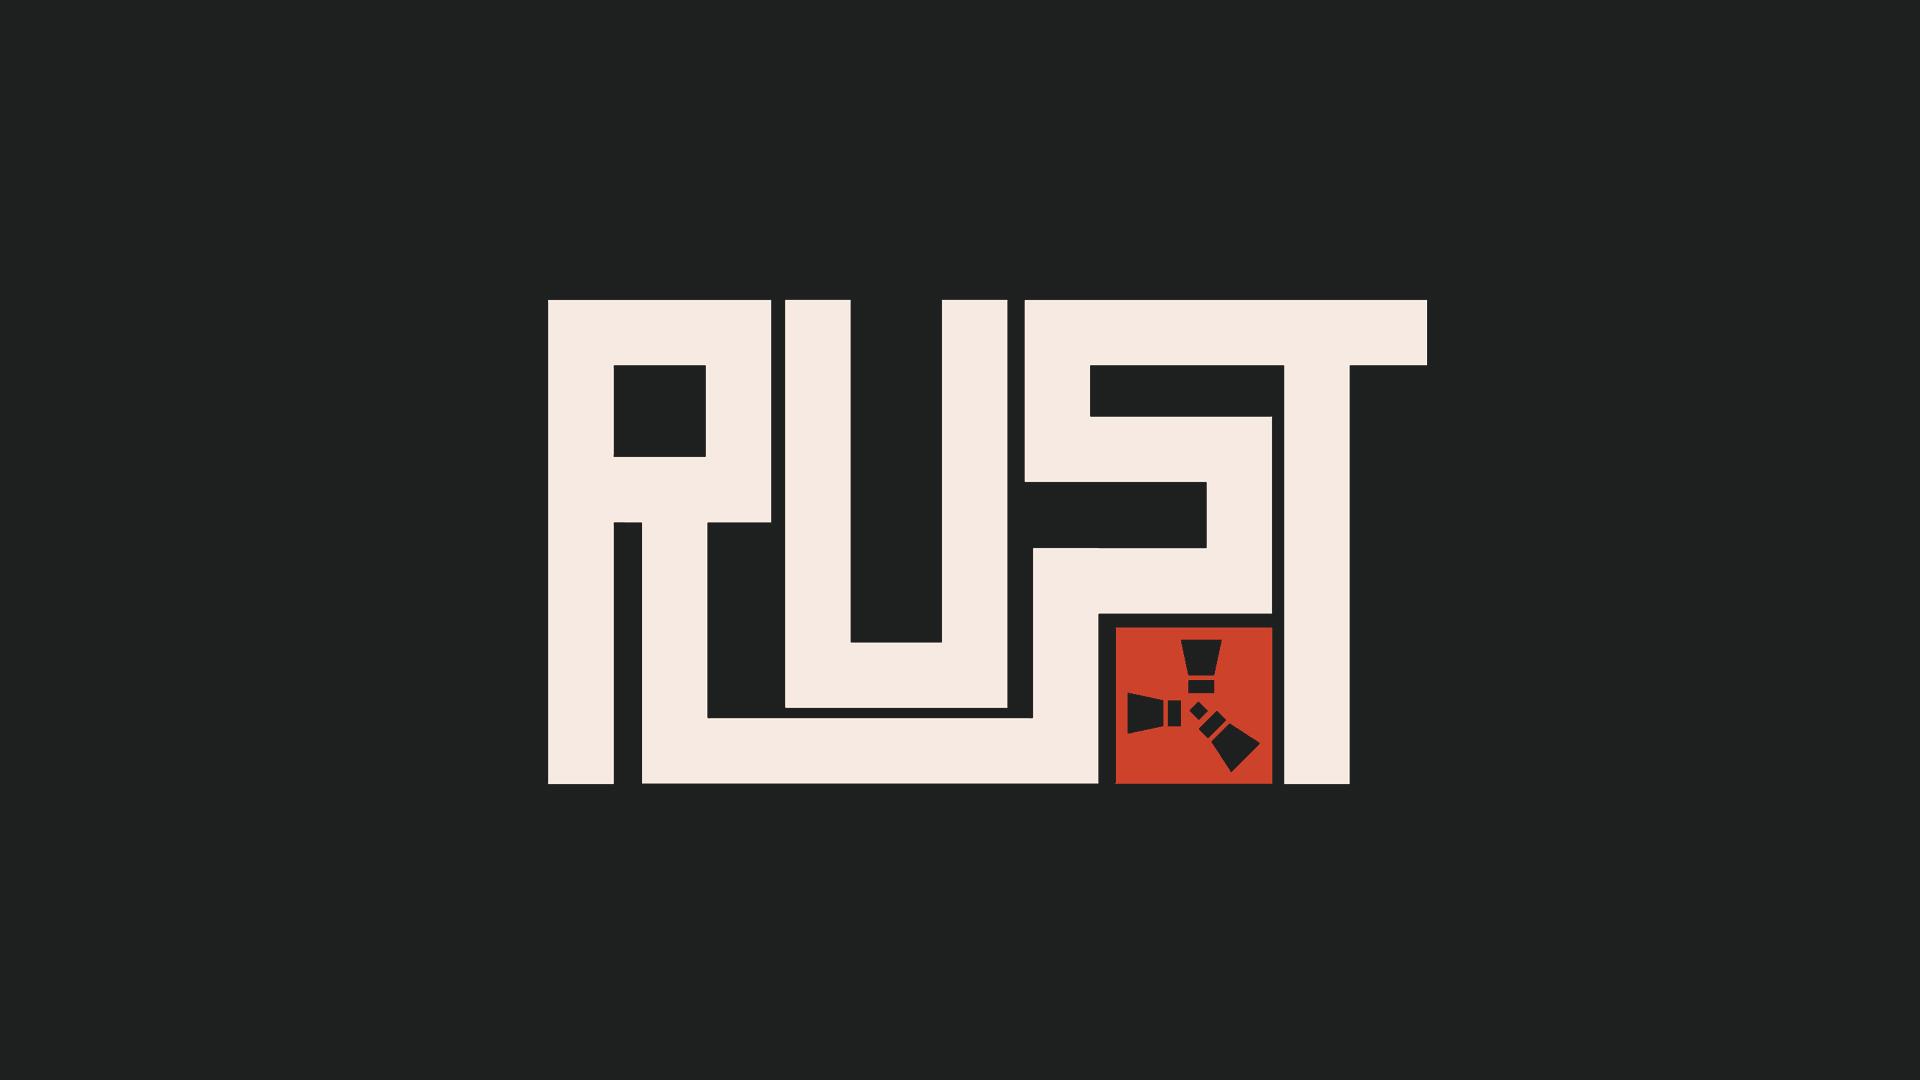 Rust wallpaper 5